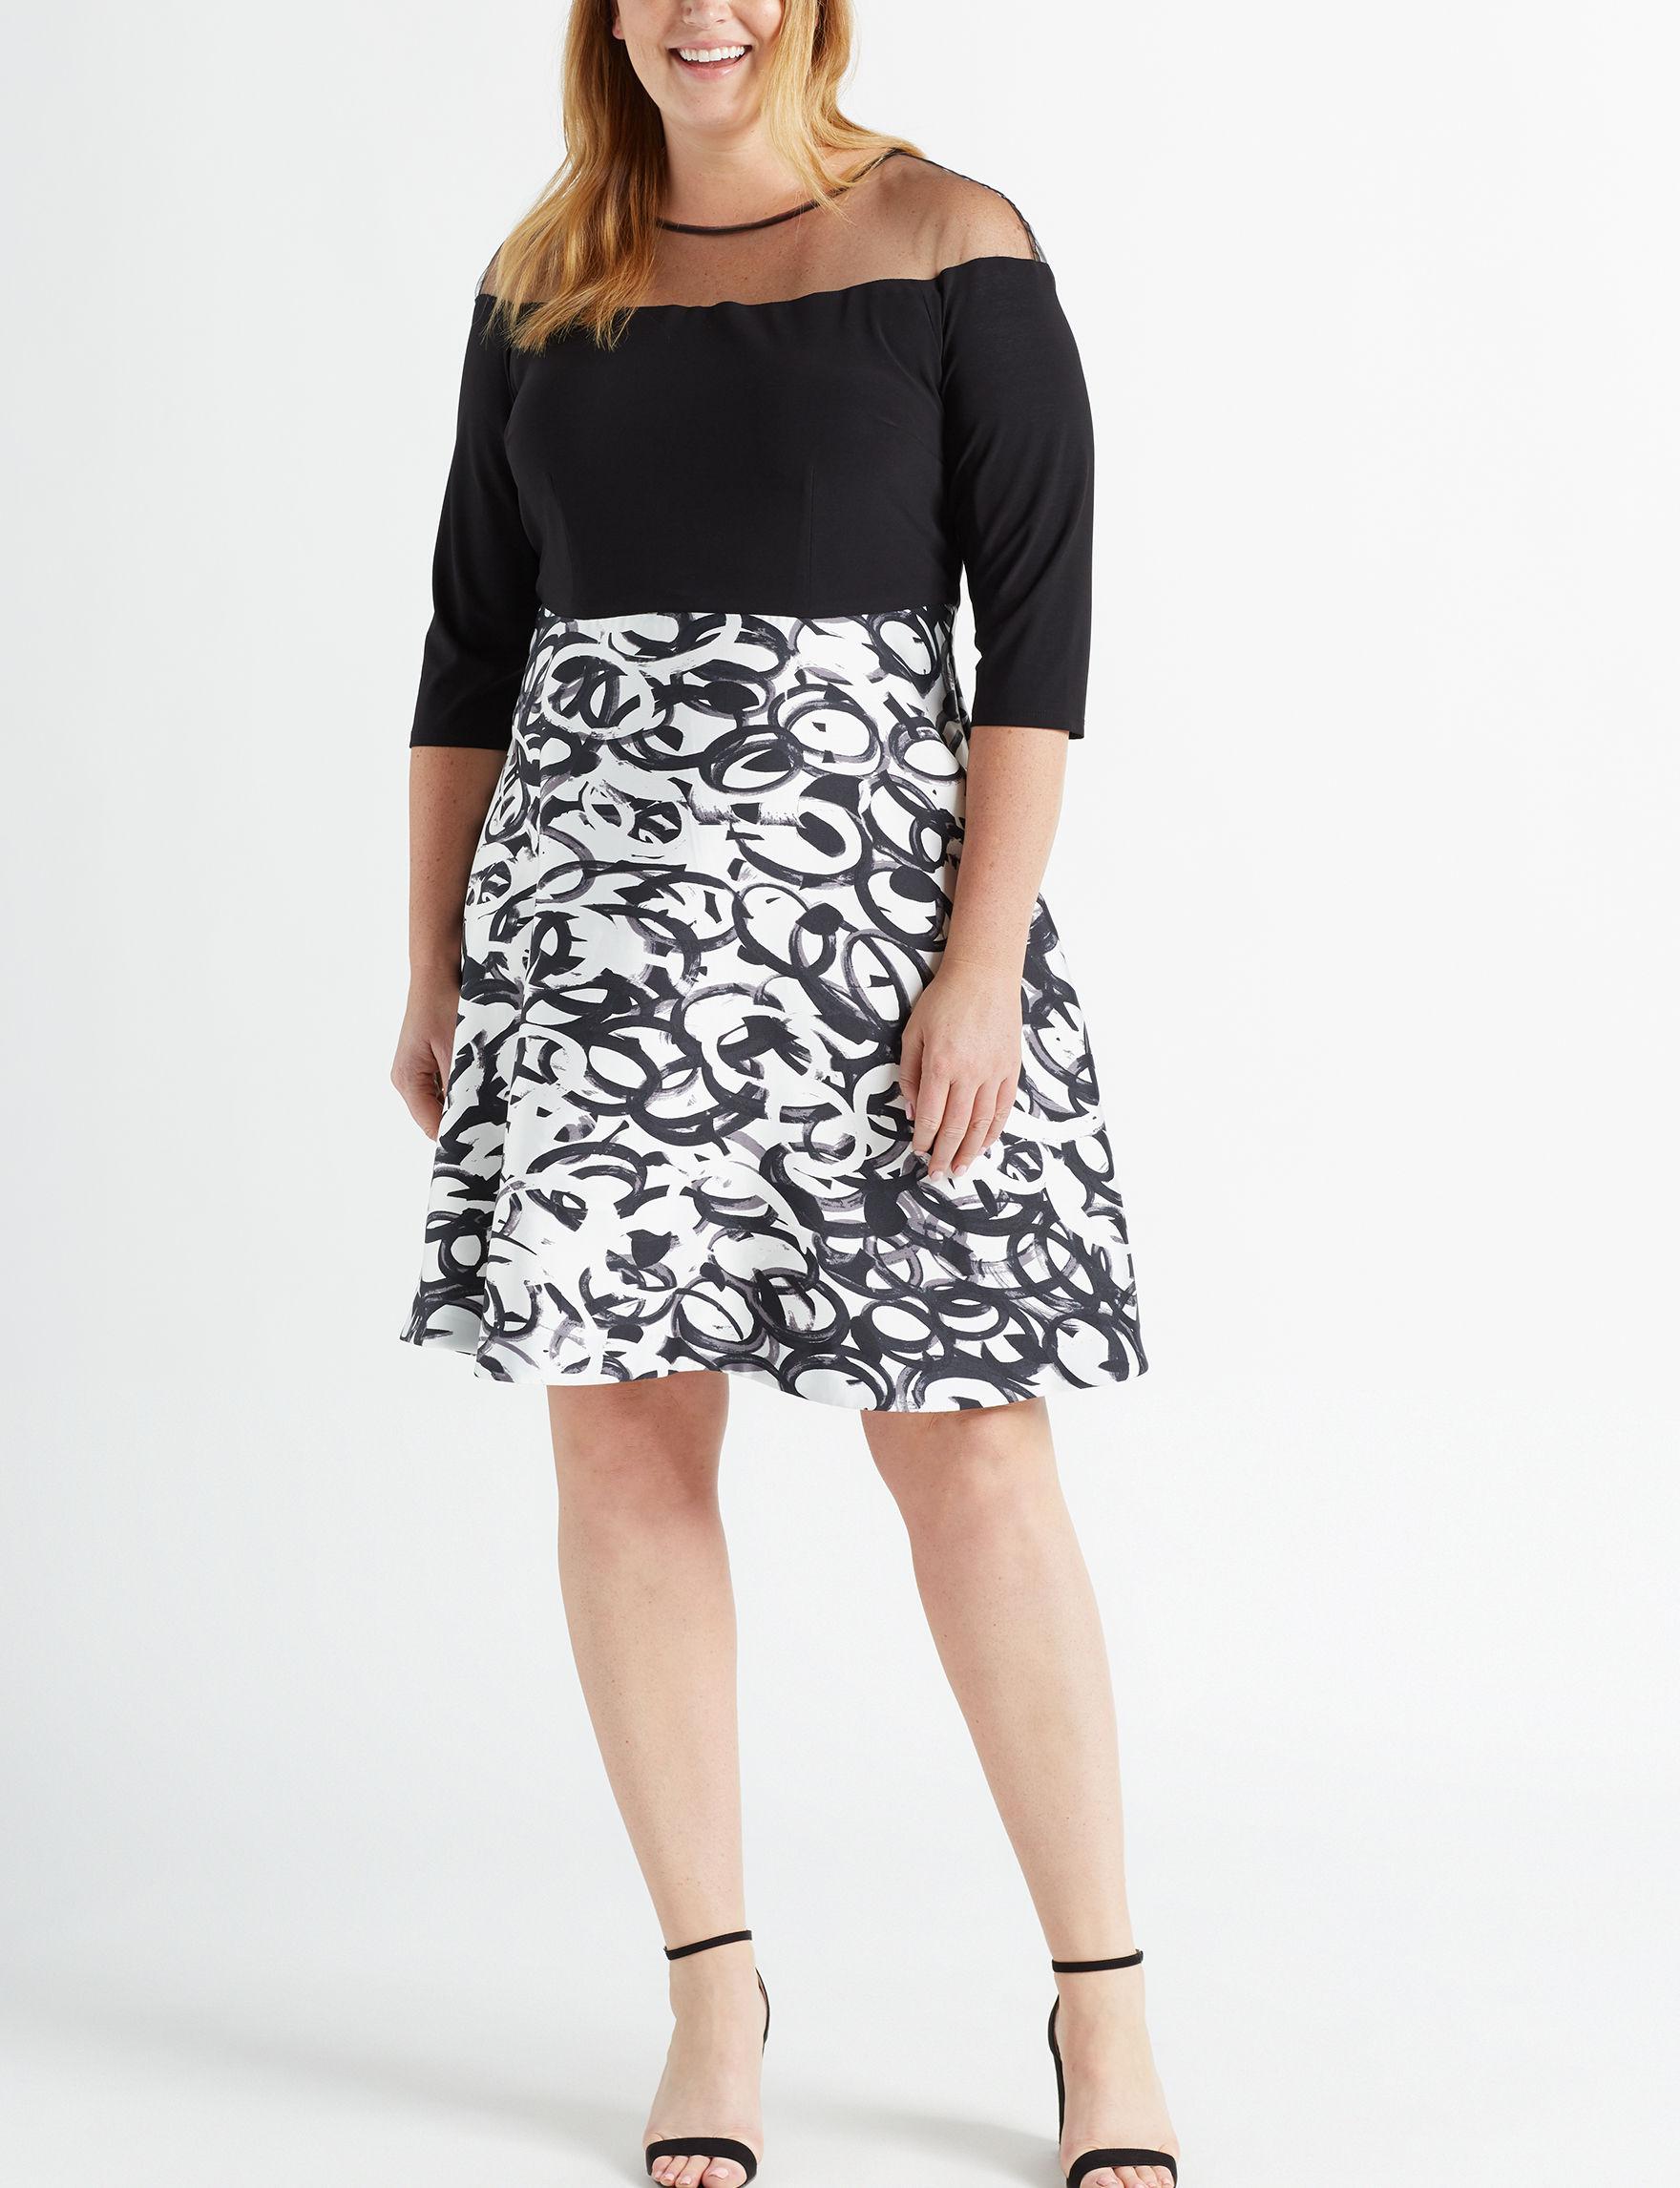 R & M Richards Black / White Cocktail & Party Evening & Formal A-line Dresses Fit & Flare Dresses